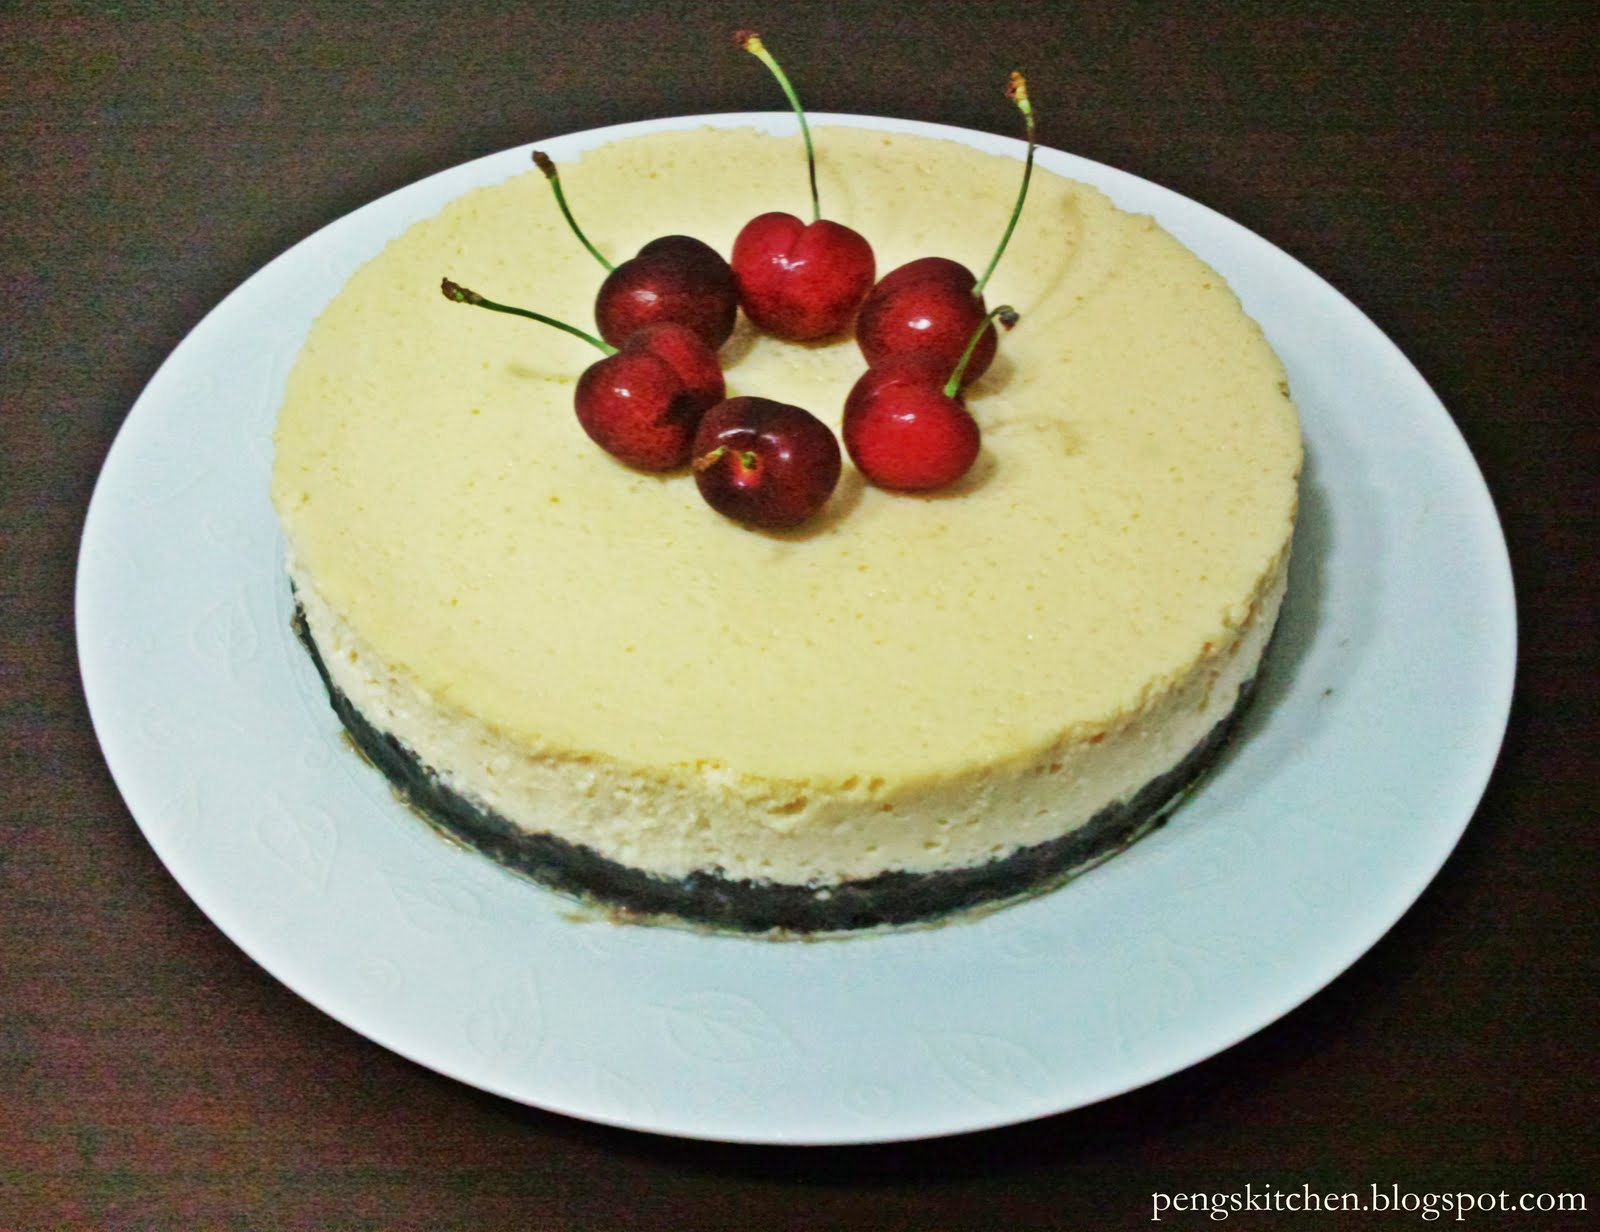 Peng's Kitchen: Baked Tofu Cheesecake